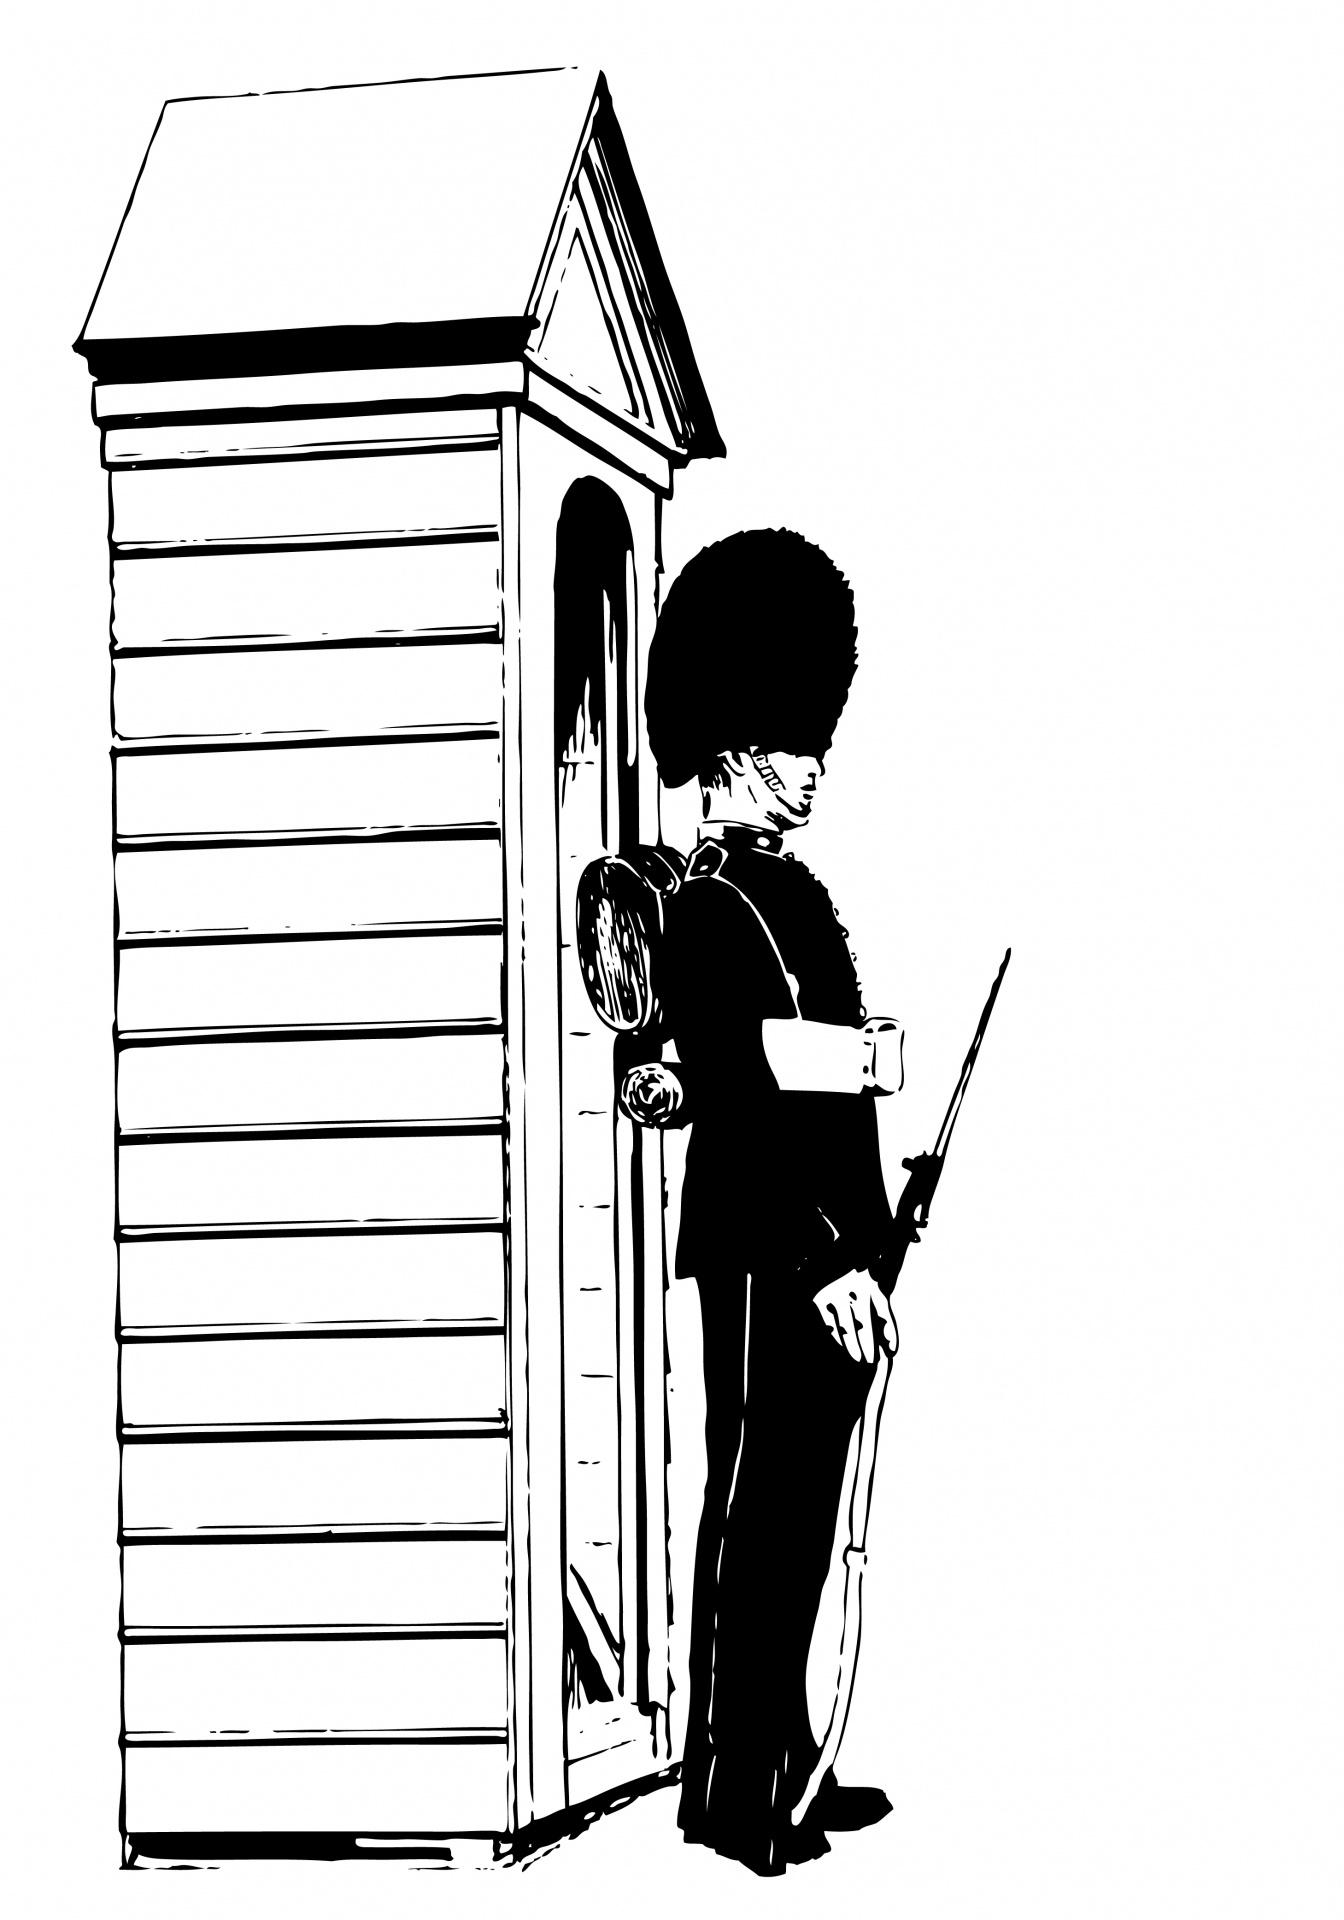 Sentry Guard Clipart Illustration Free Stock Photo